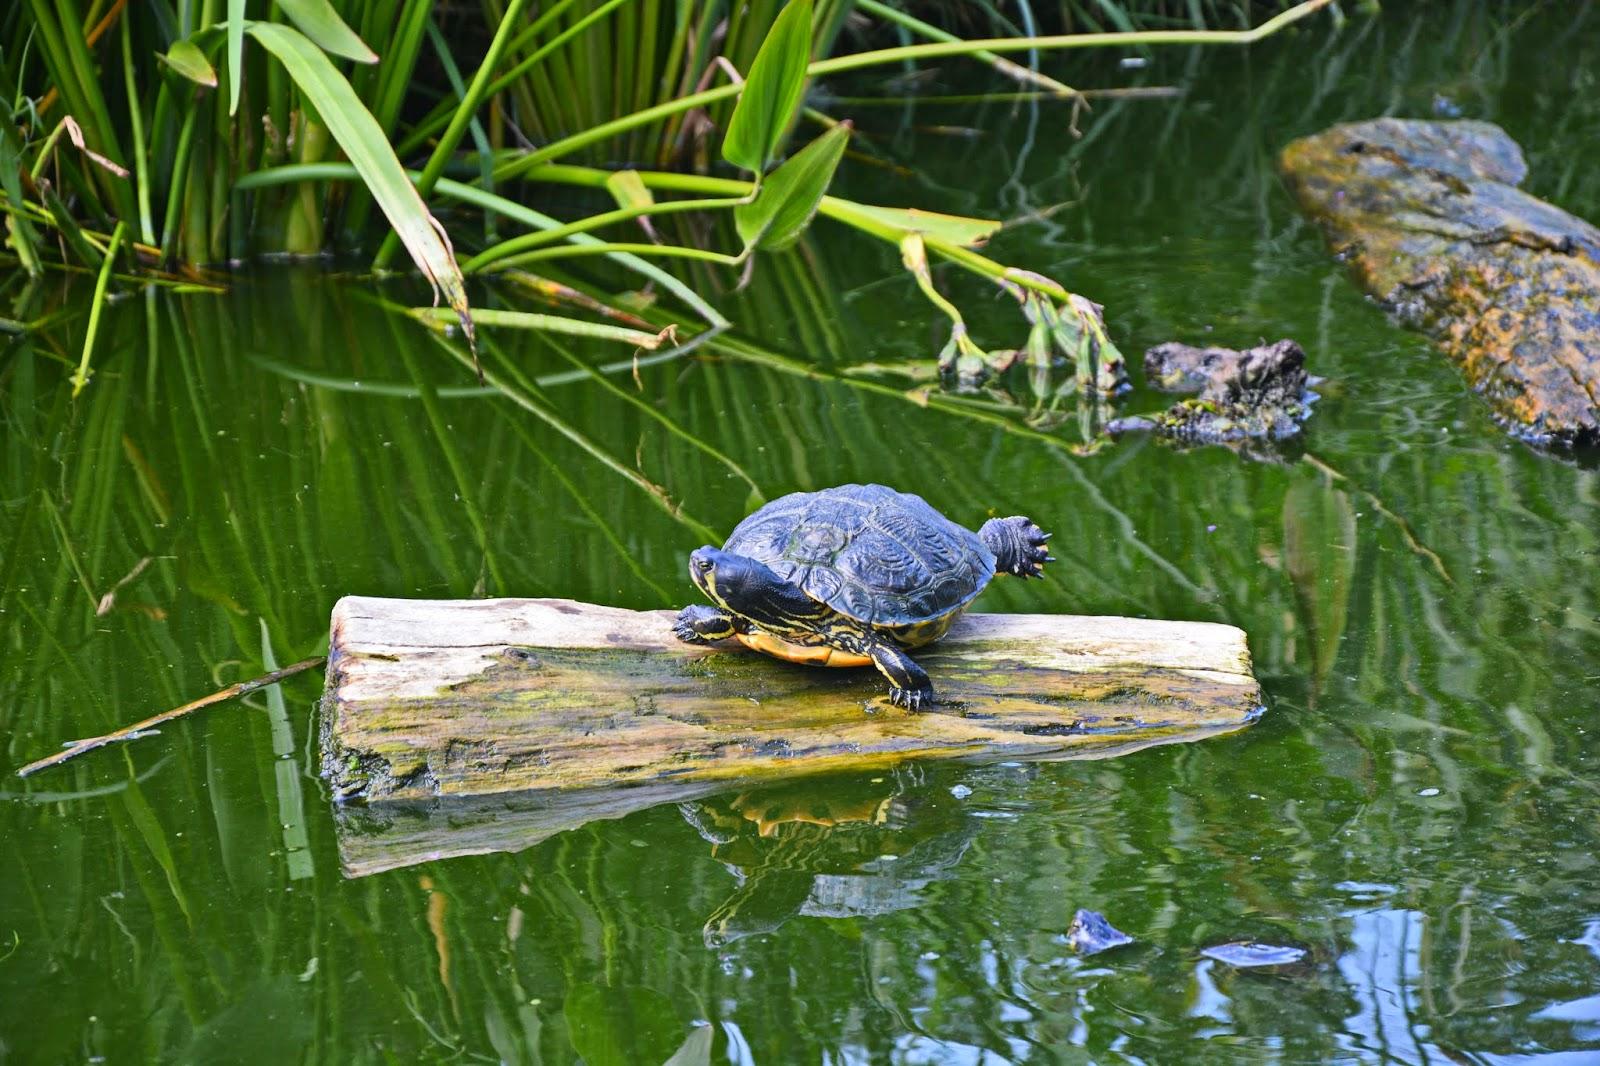 tortoise sunbathes